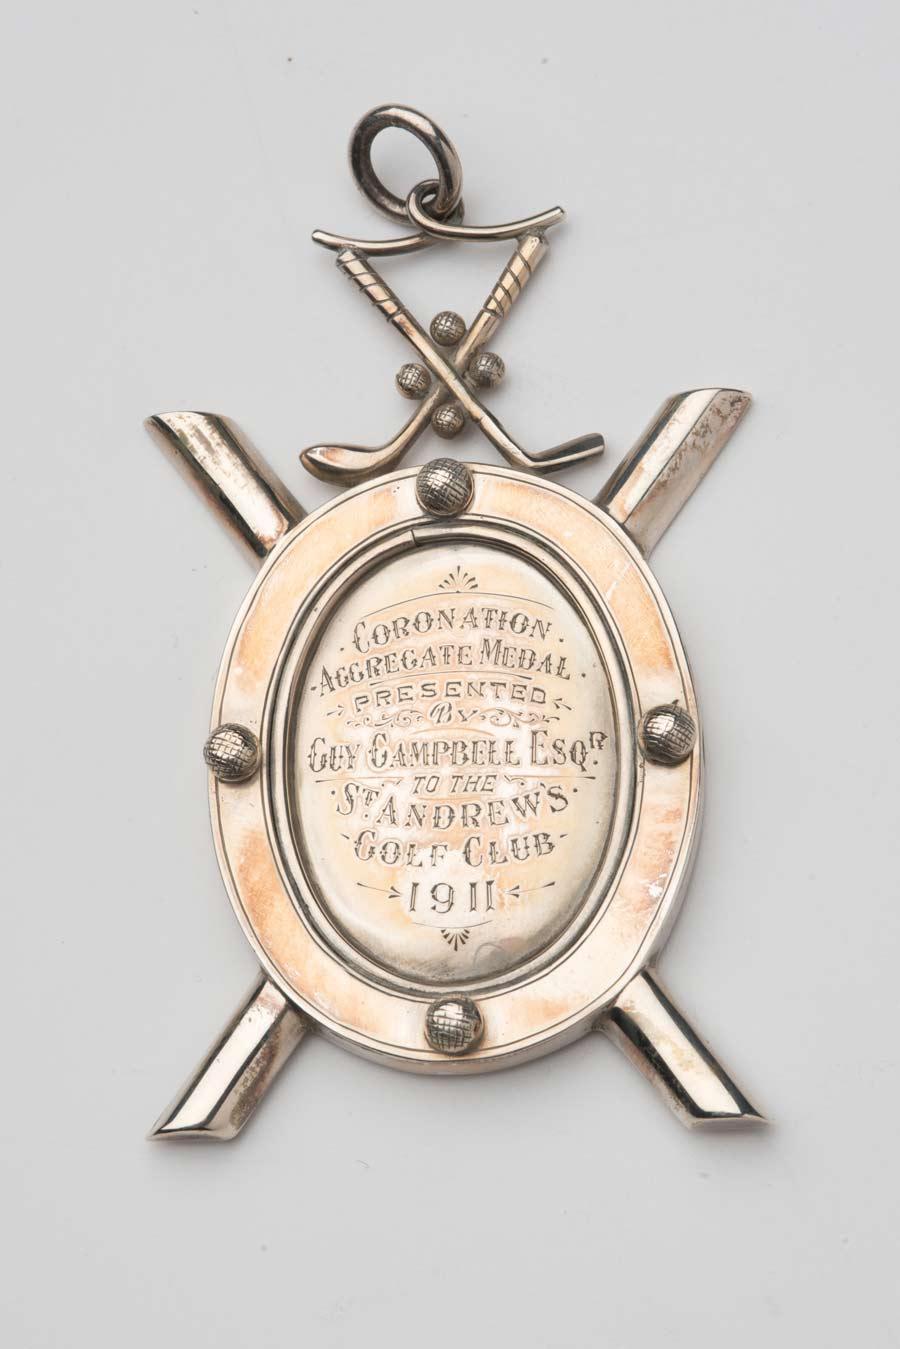 The Coronation Medal